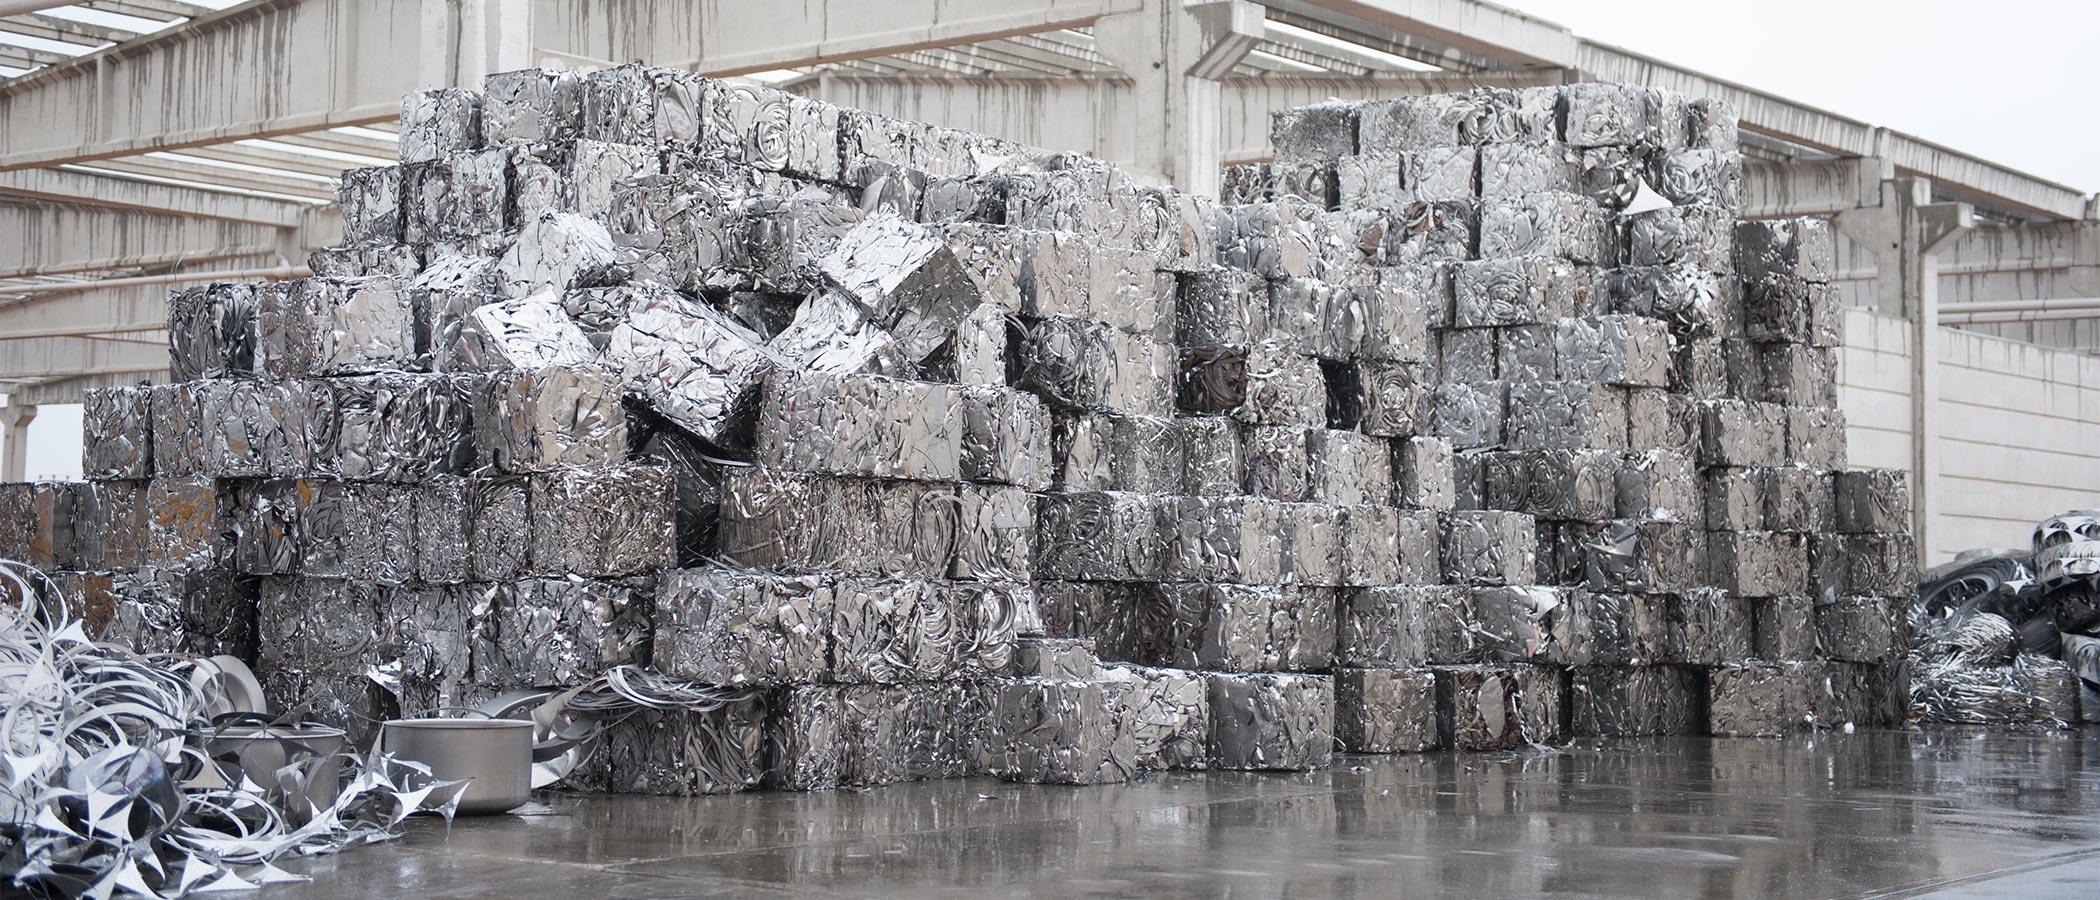 Stacks of aluminium blocks at recycling yard